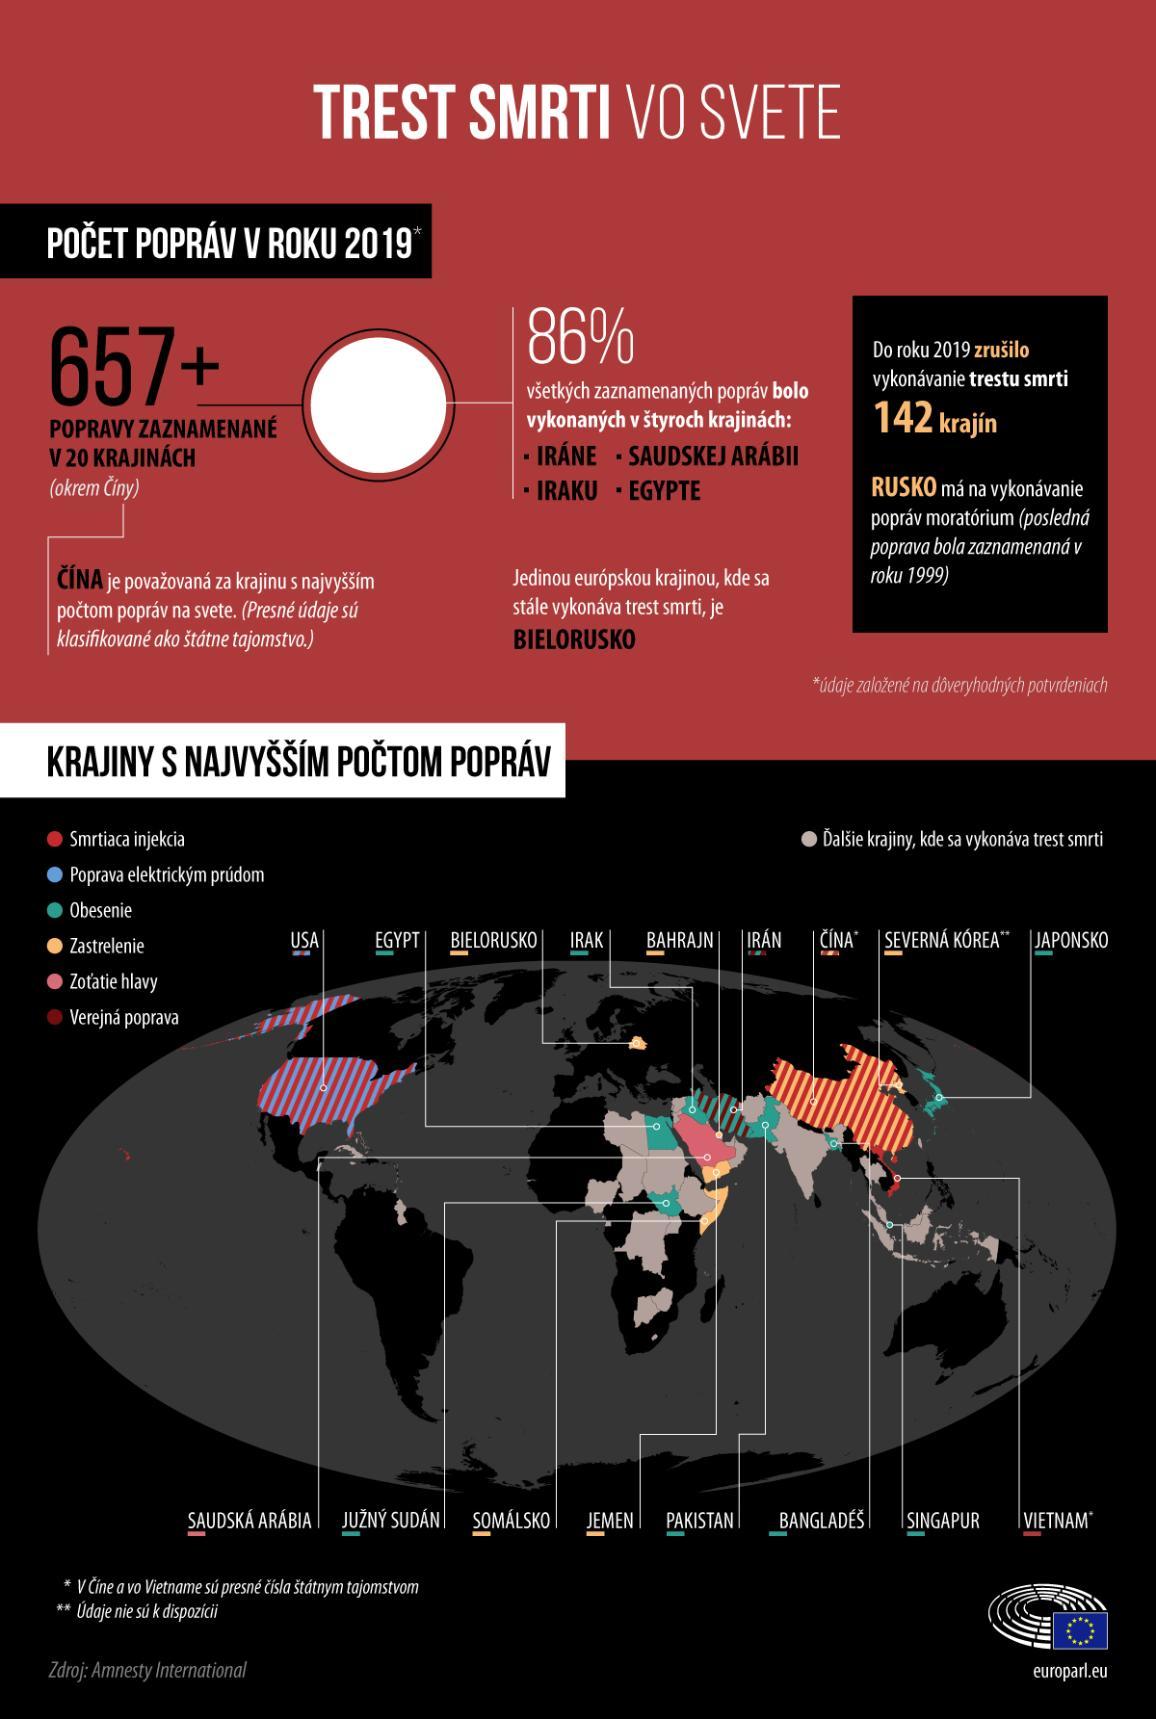 infografika o trestoch smrti vo svete